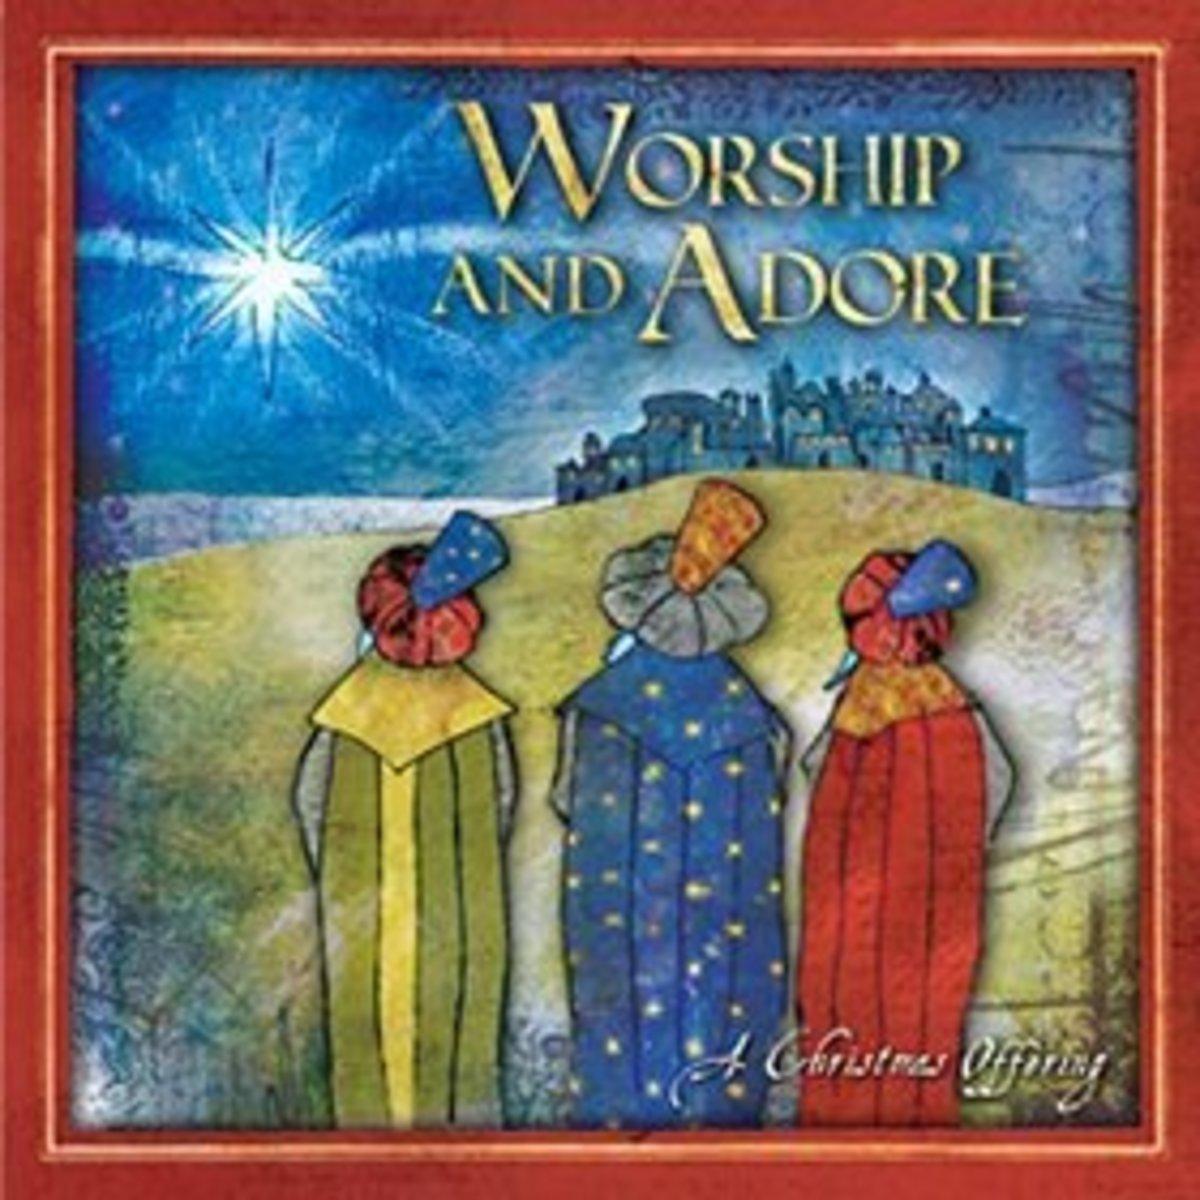 2020 Christmas Albums Christian Christmas Albums Christian Artists 2020 | Cnfwct.newyear2020blog.site